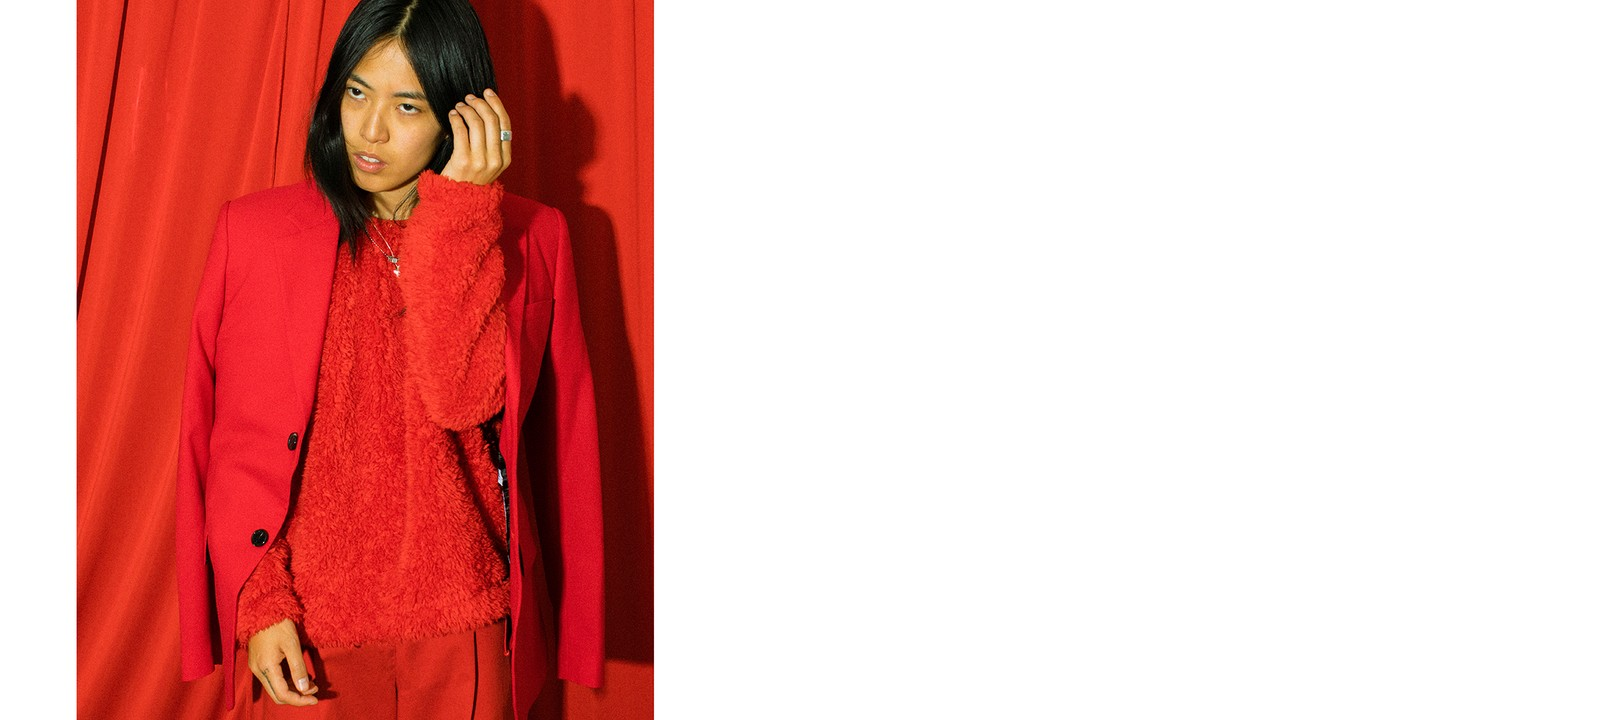 Deb Never WEDIDIT Artist LA Los Angeles Red Raf Simons Suit Blazer Jacket Editorial